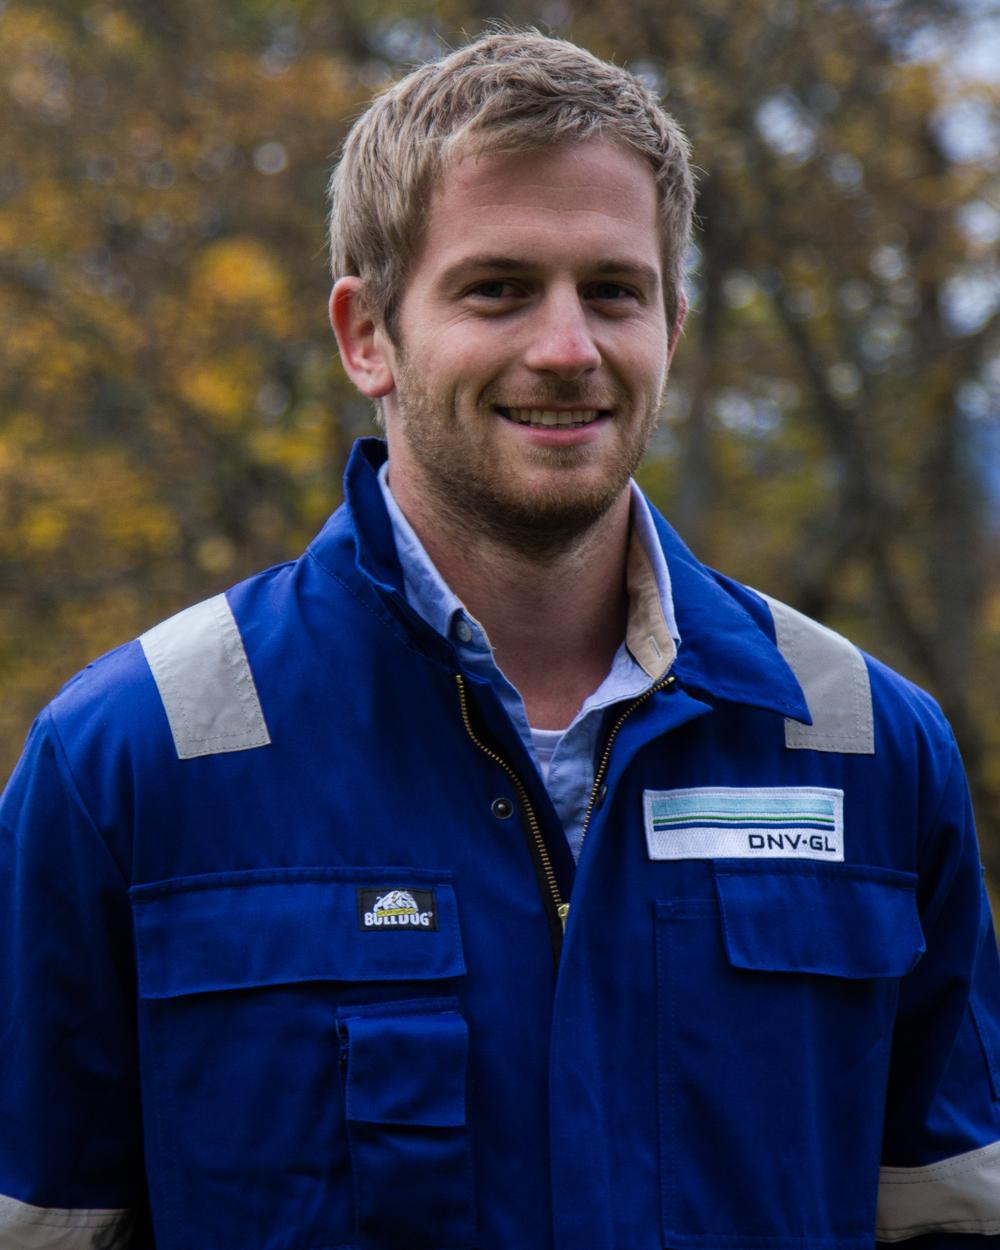 Benjamin Halsøy – Production manager Studies: Mechanical engineering Campus: NTNU Gløshaugen Hometown: Bergen, Norway